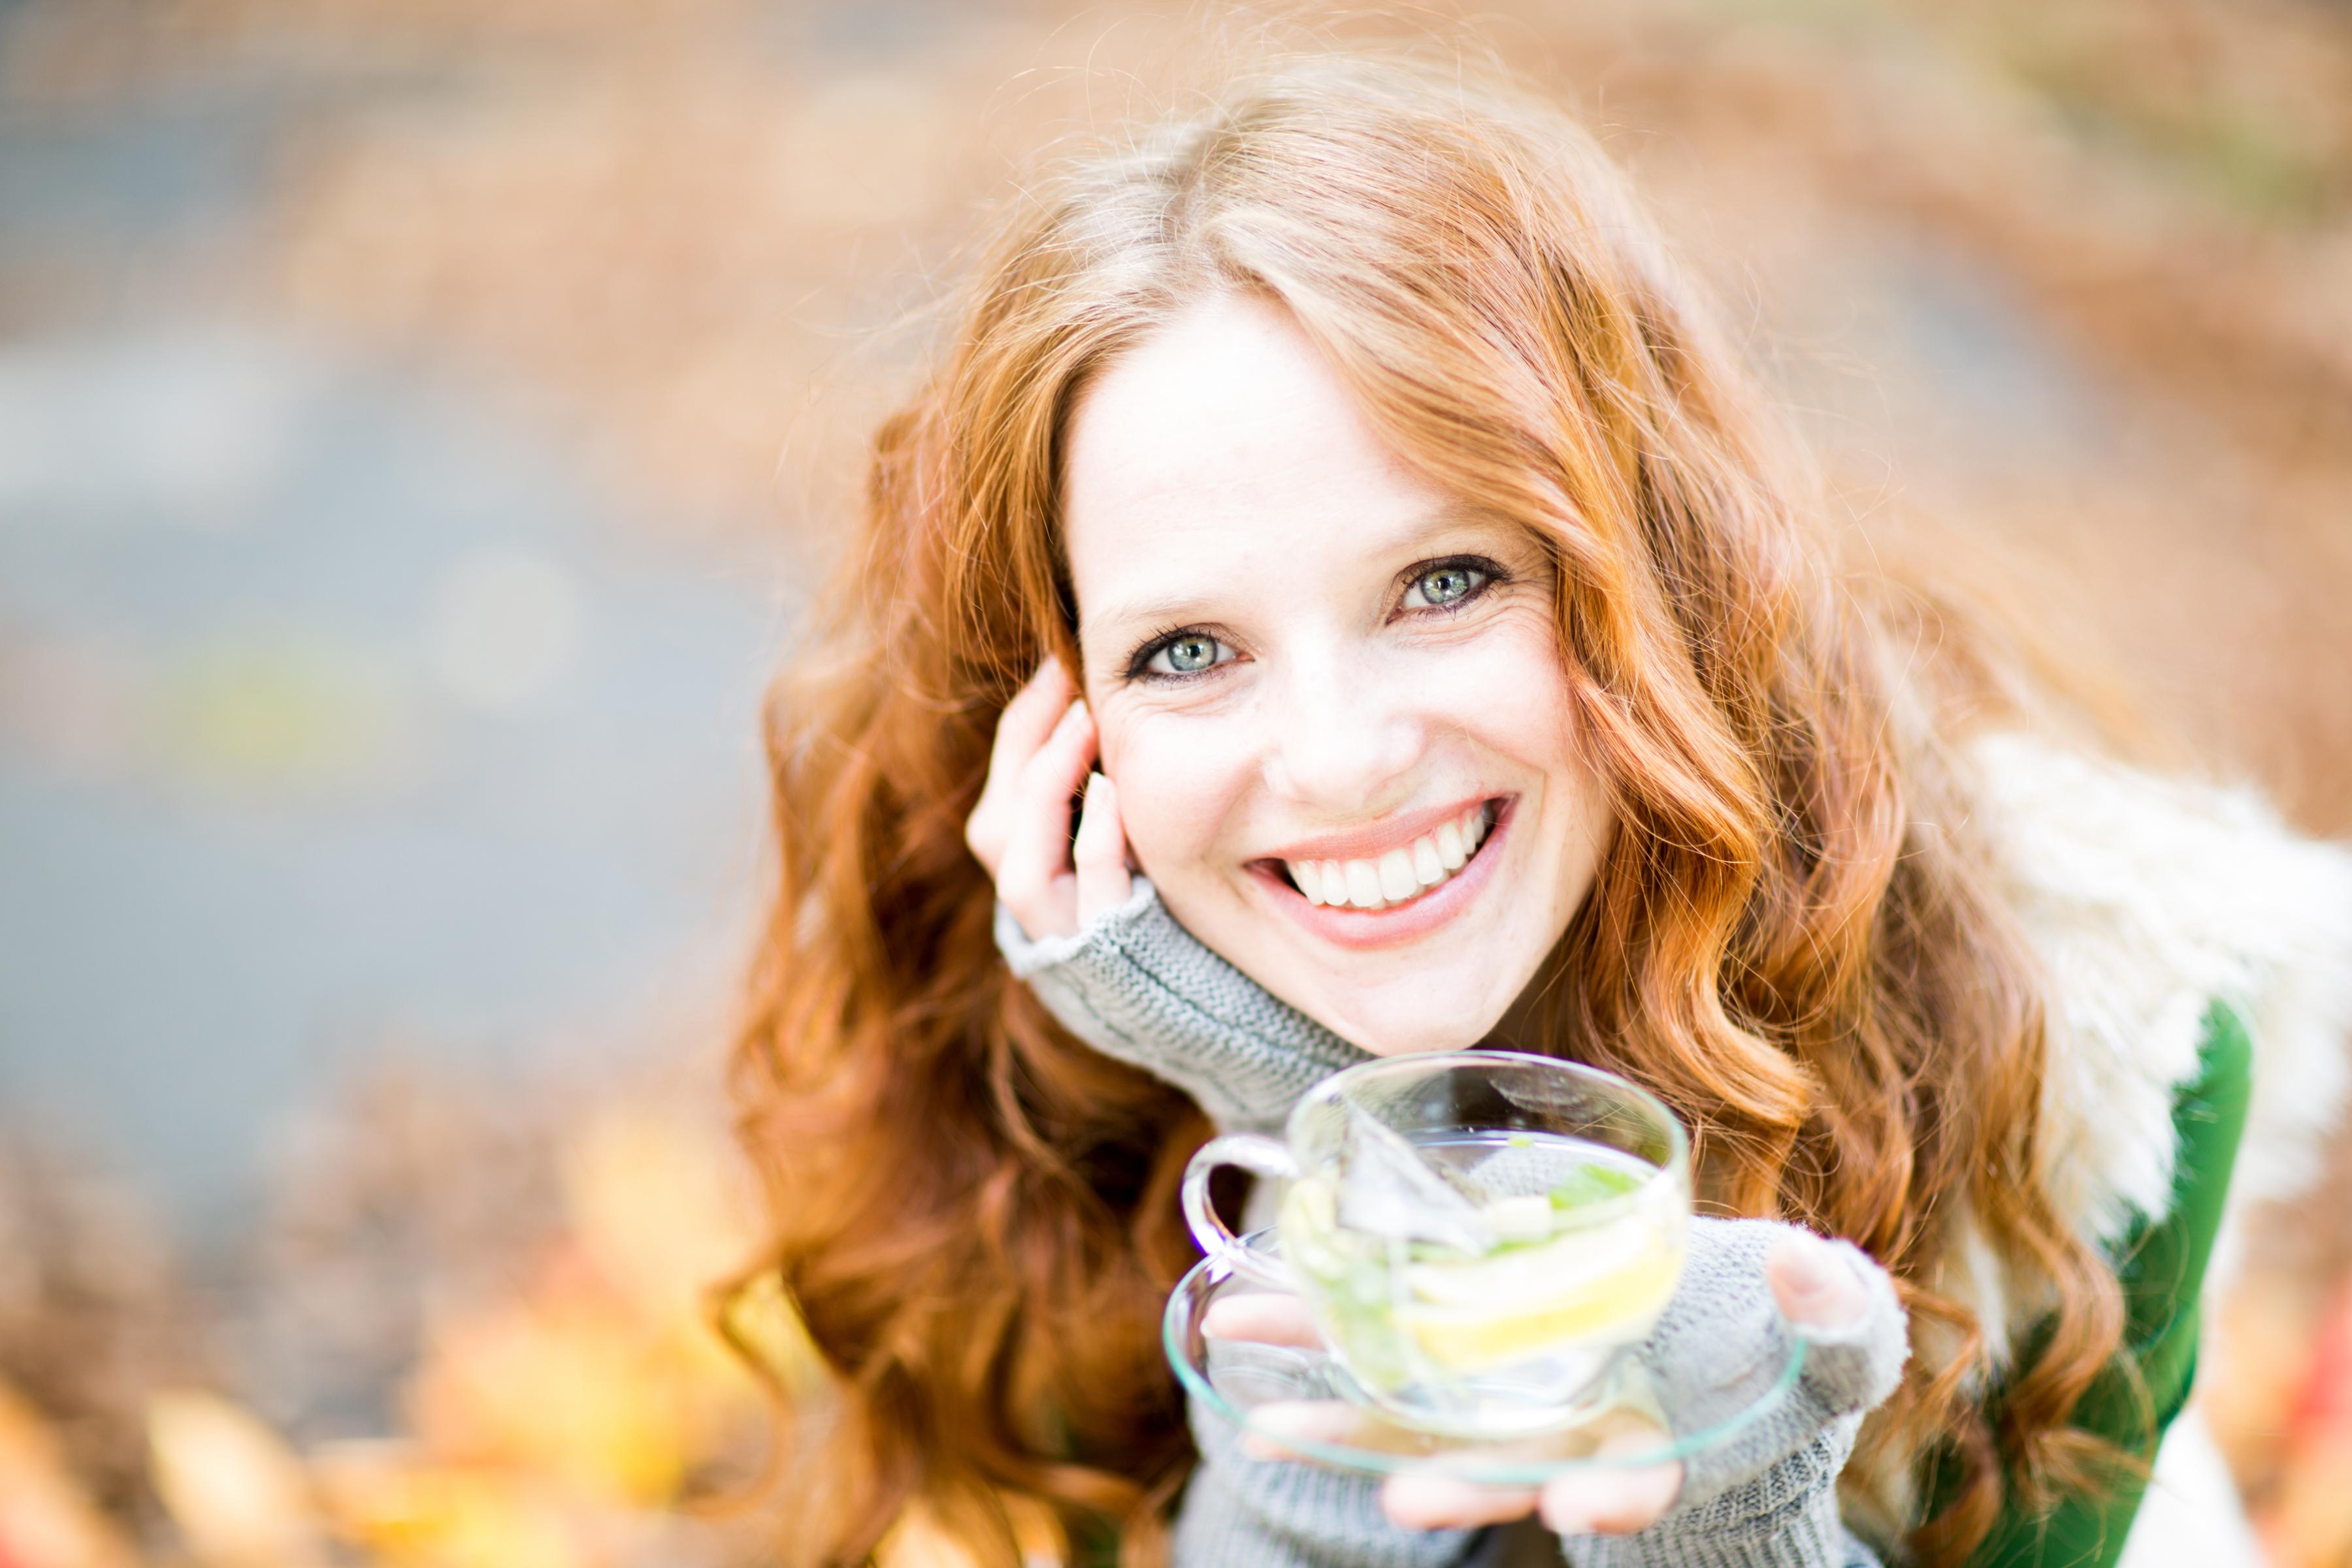 Depth Of Field Face Girl Model Redhead Smile Tea Woman 3600x2400